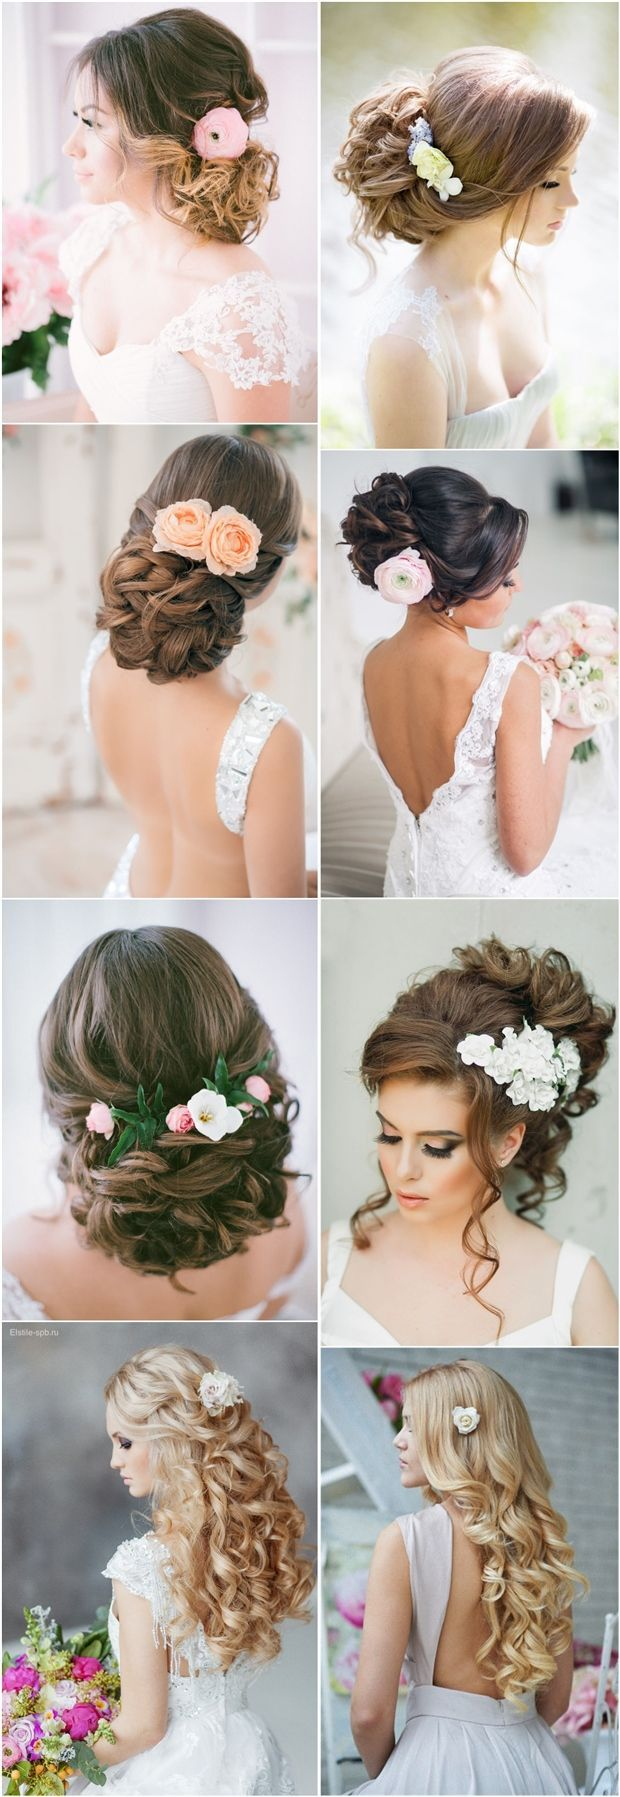 Romantic Long Wedding Hairstyles Using Flowers Romantic - Wedding hairstyle romantic with flowers